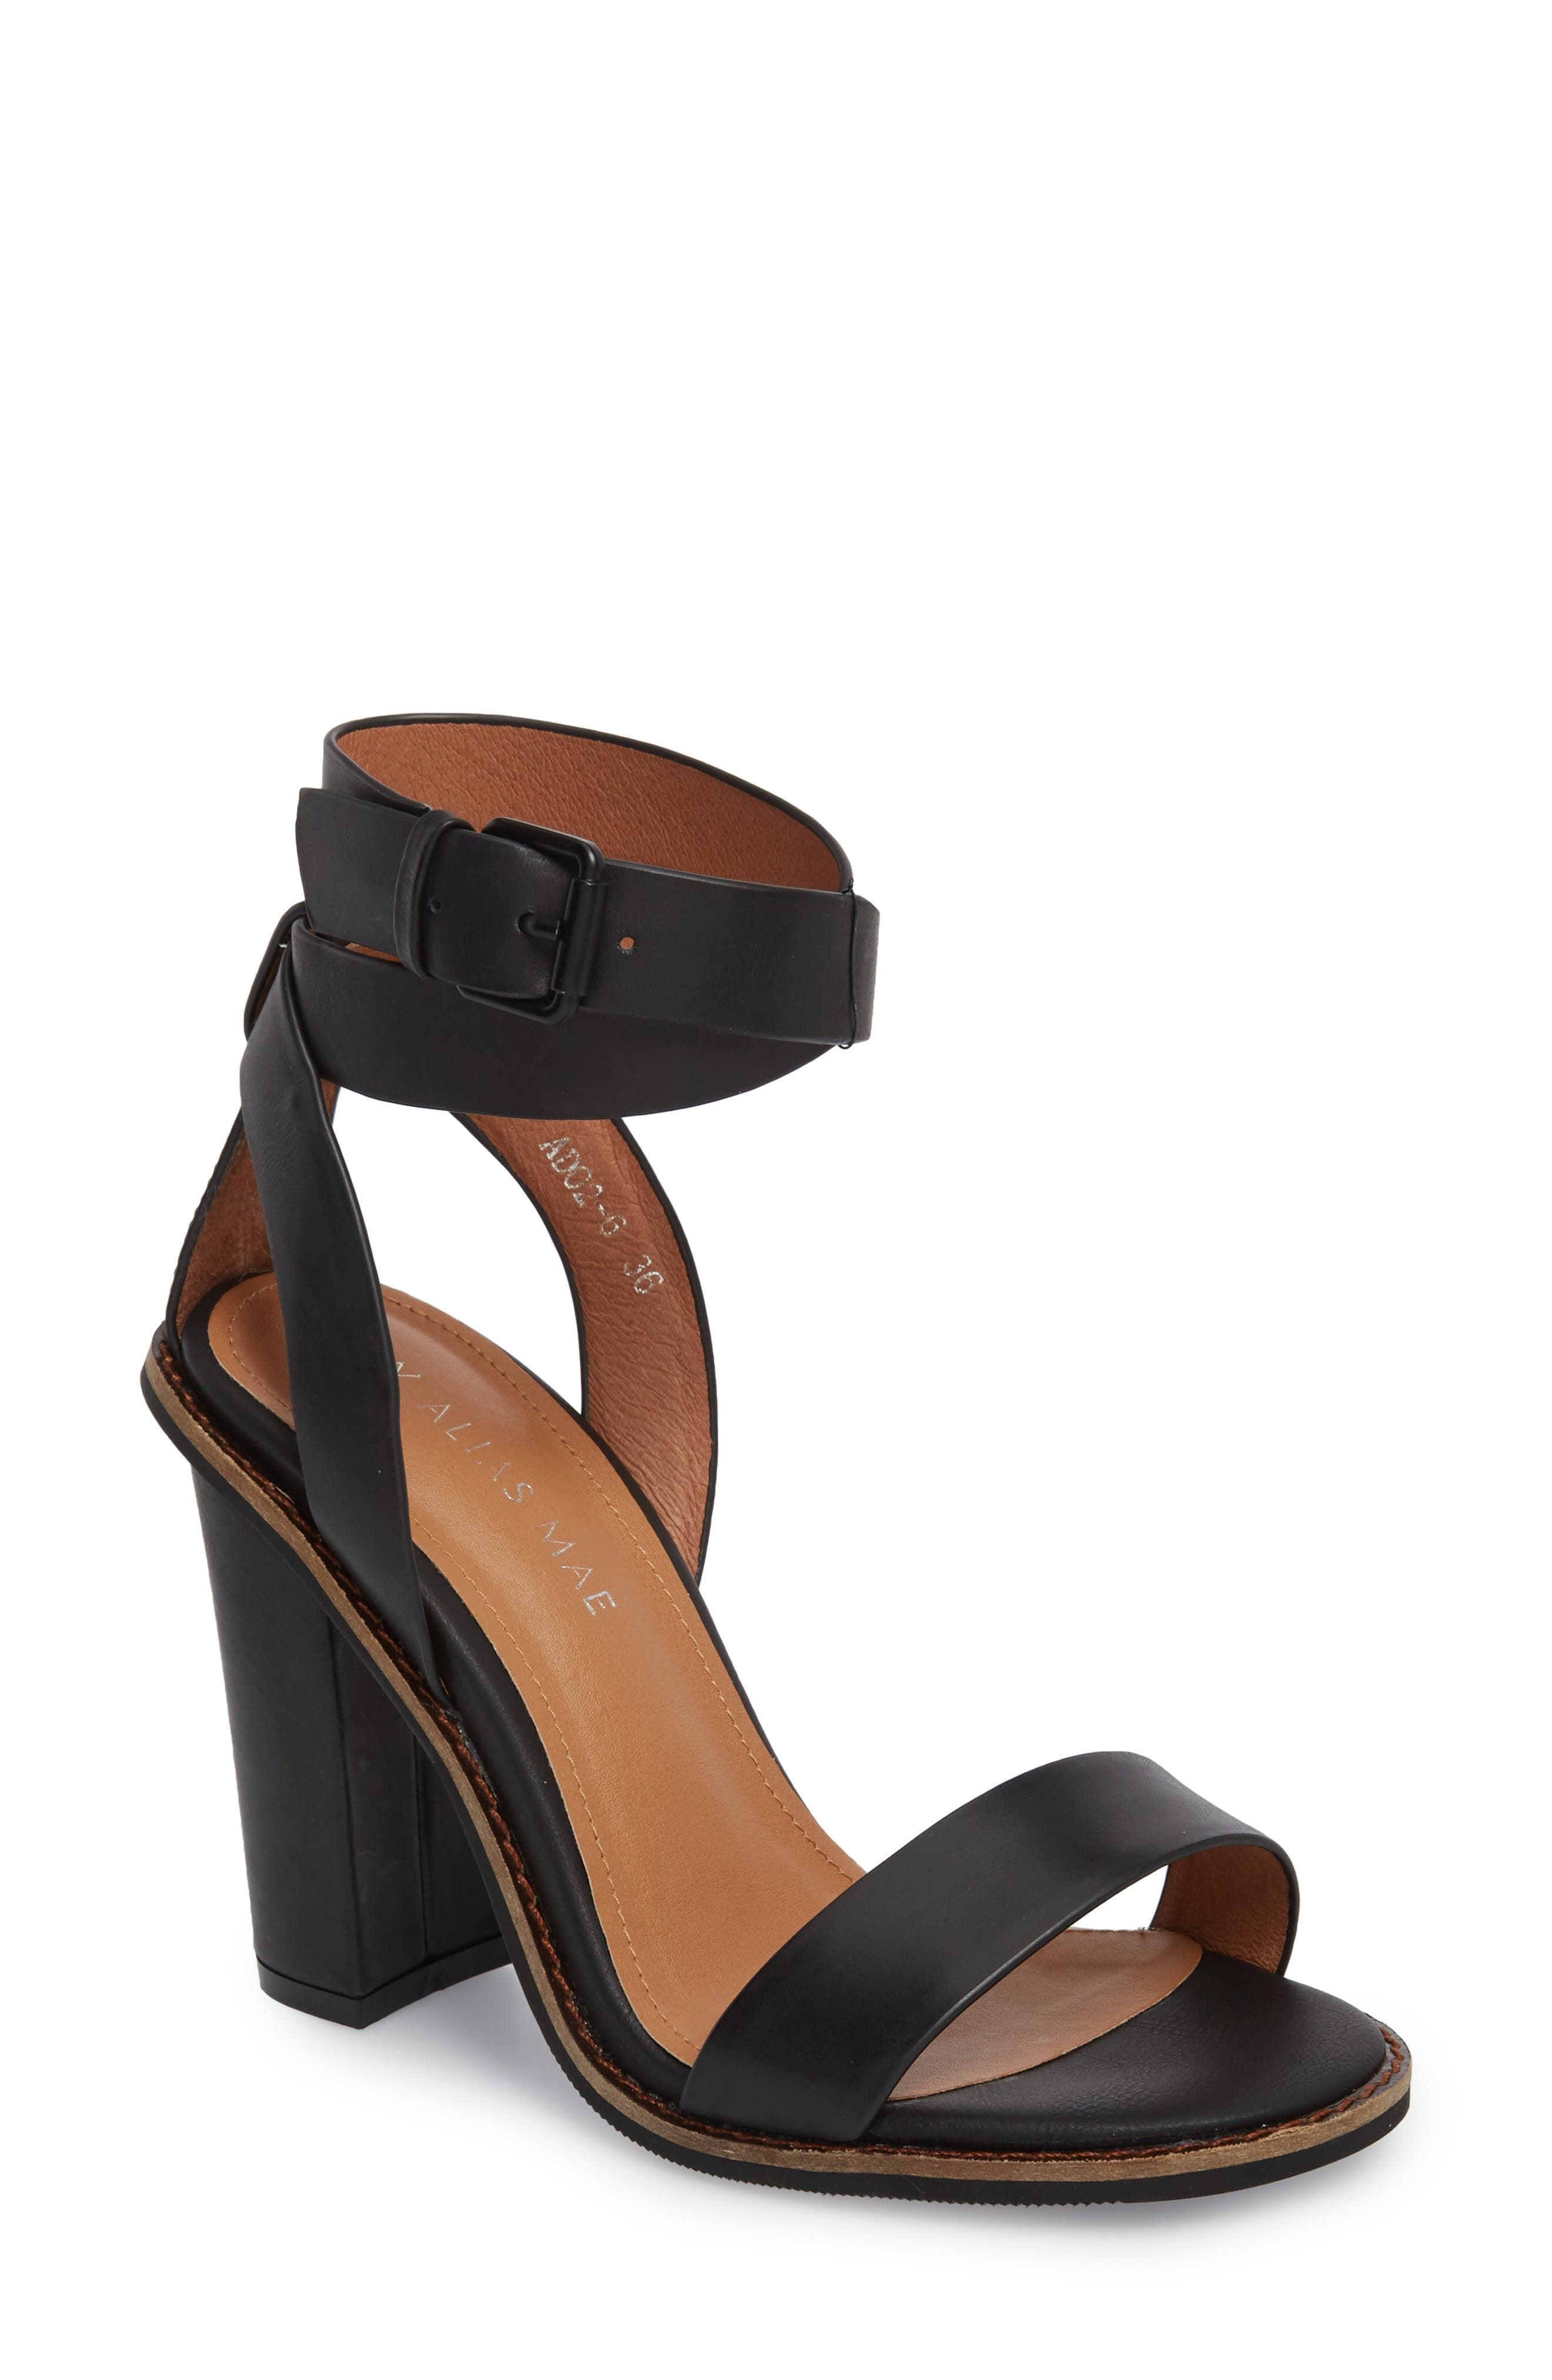 Calito Ankle Strap Sandal,                         Main,                         color, 001